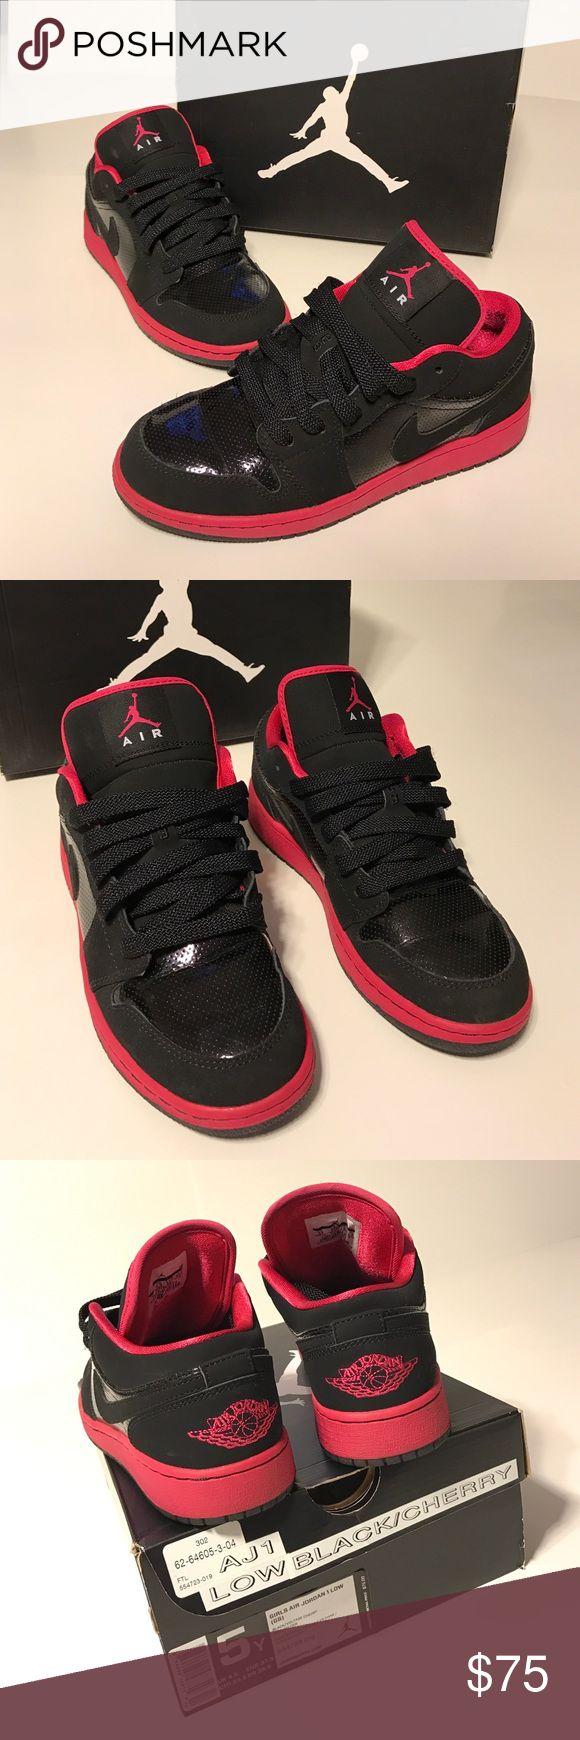 Air Jordan 1 Low Cherry GS 5Y Girls Air Jordan 1 Low Grade School Size 5Y Black/ Voltage Cherry , comes in original Box Jordan Shoes Sneakers